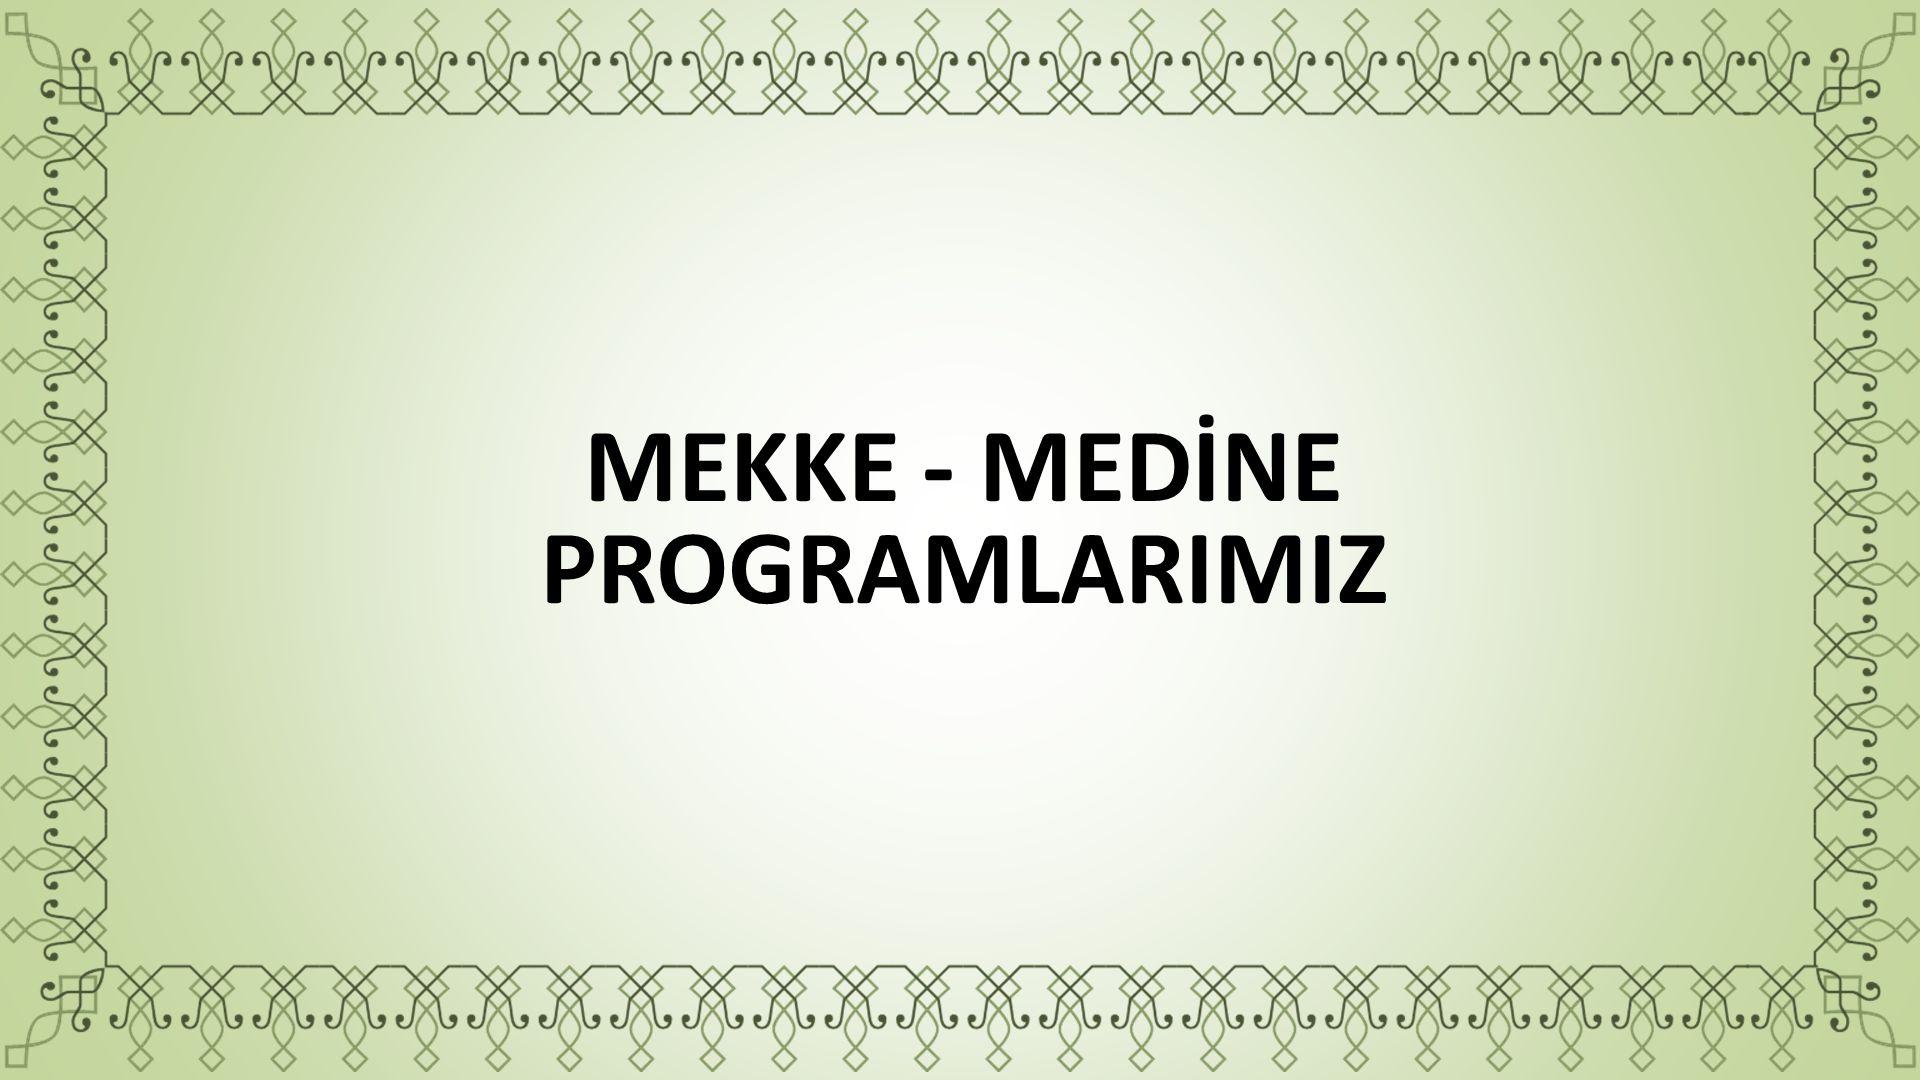 MEKKE - MEDİNE PROGRAMLARIMIZ